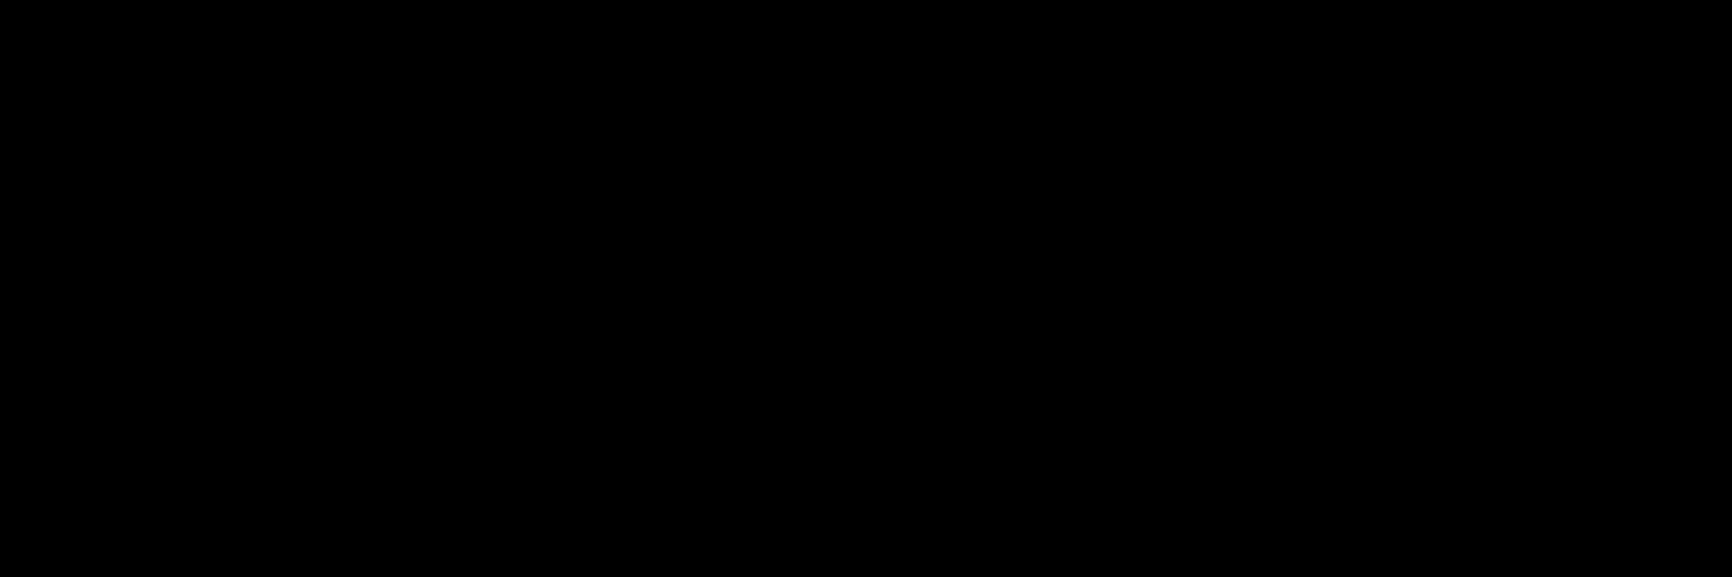 image62.png